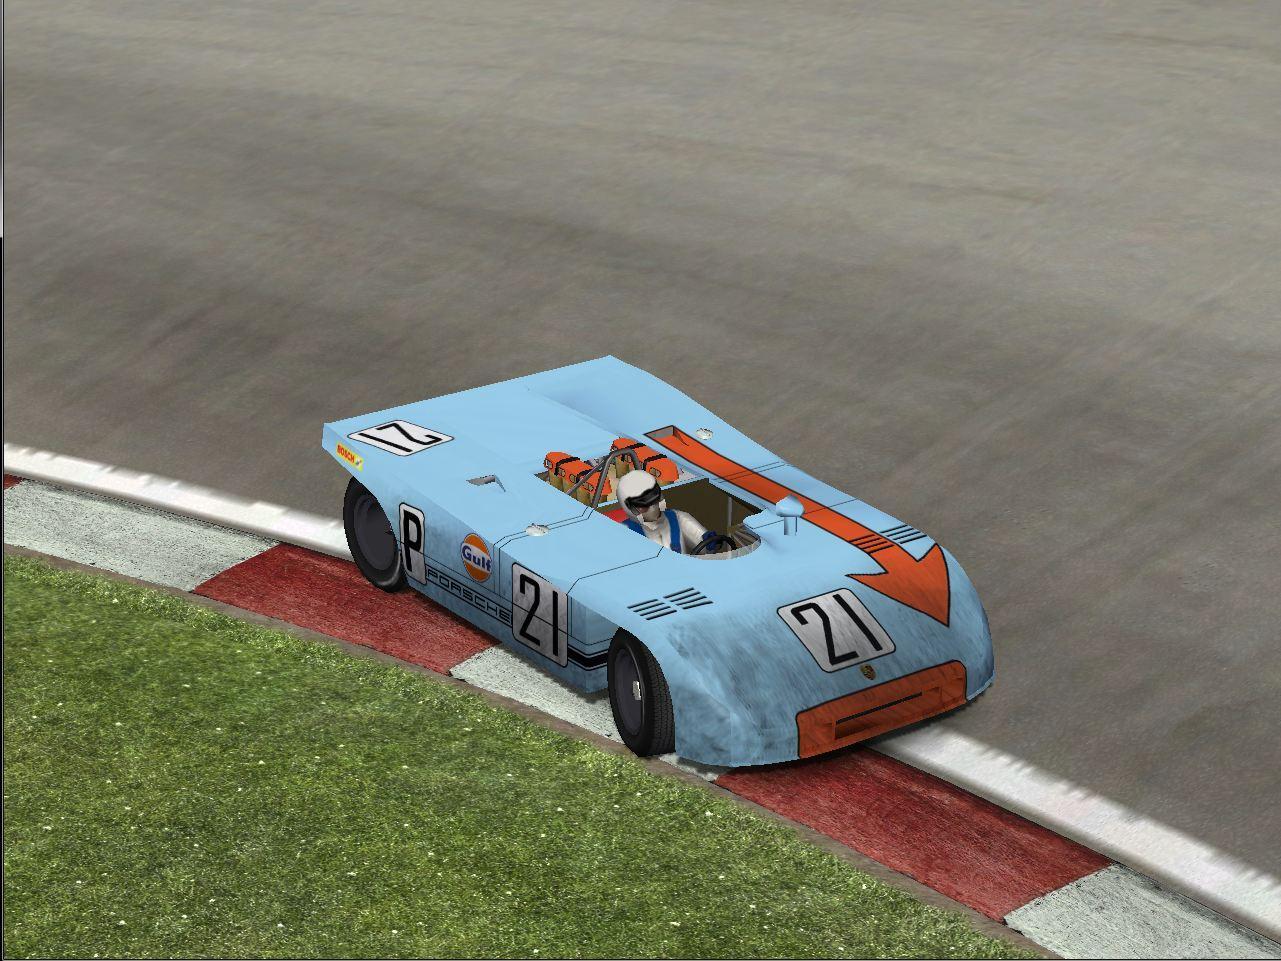 [GTL] Porsche 908-03 Blfef4iv81cyj9ltp